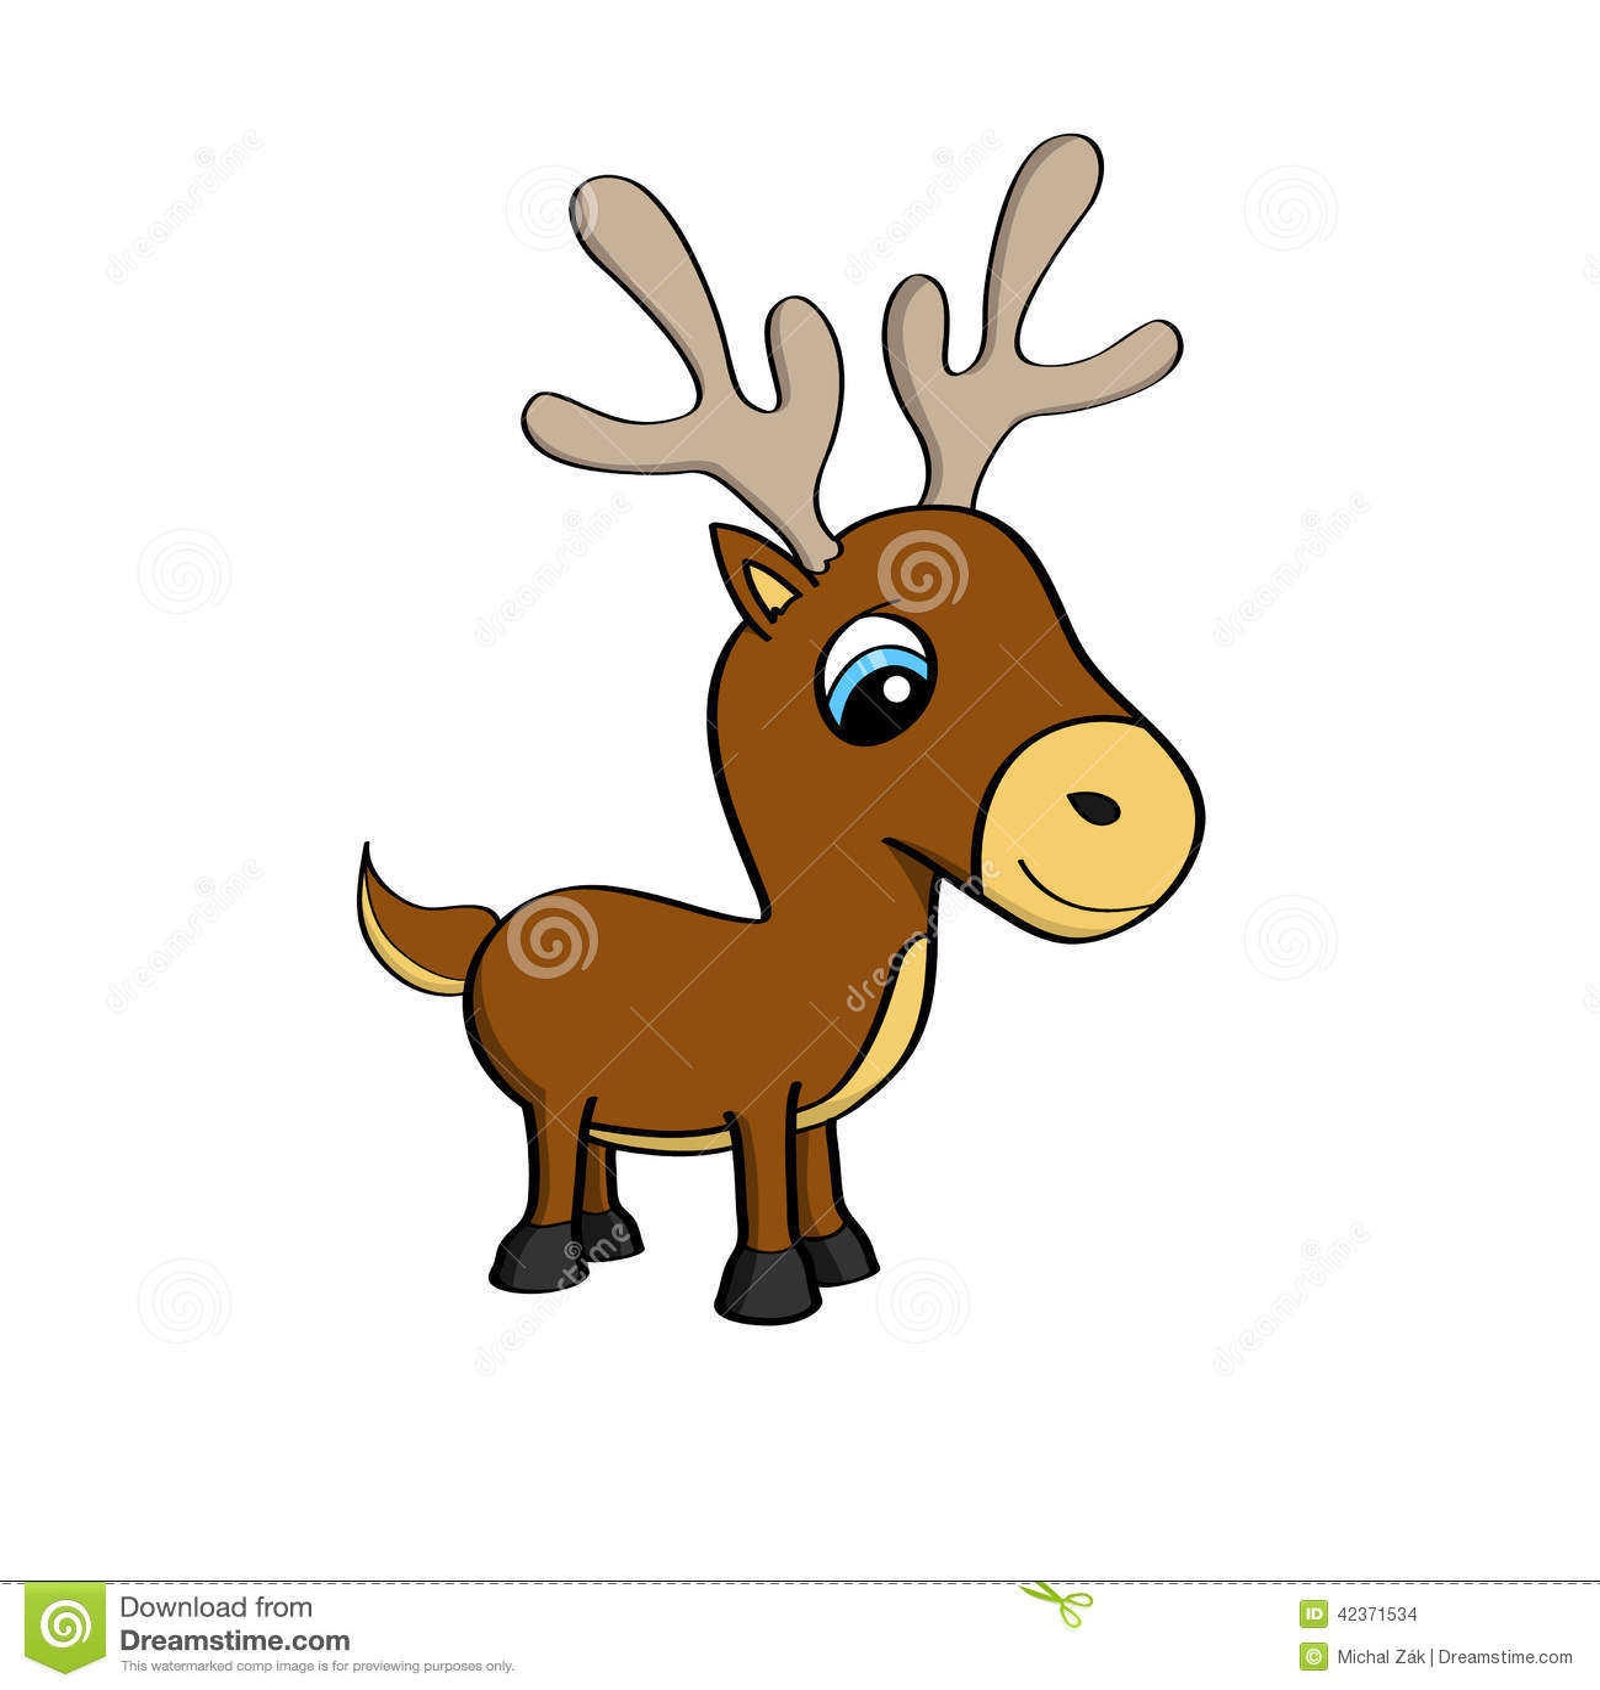 Cute cartoon animals with big eyes - Cute Cartoon Animals With Big Eyes Cartoon Illustration Of A Cute Little Reindeer With Big Download